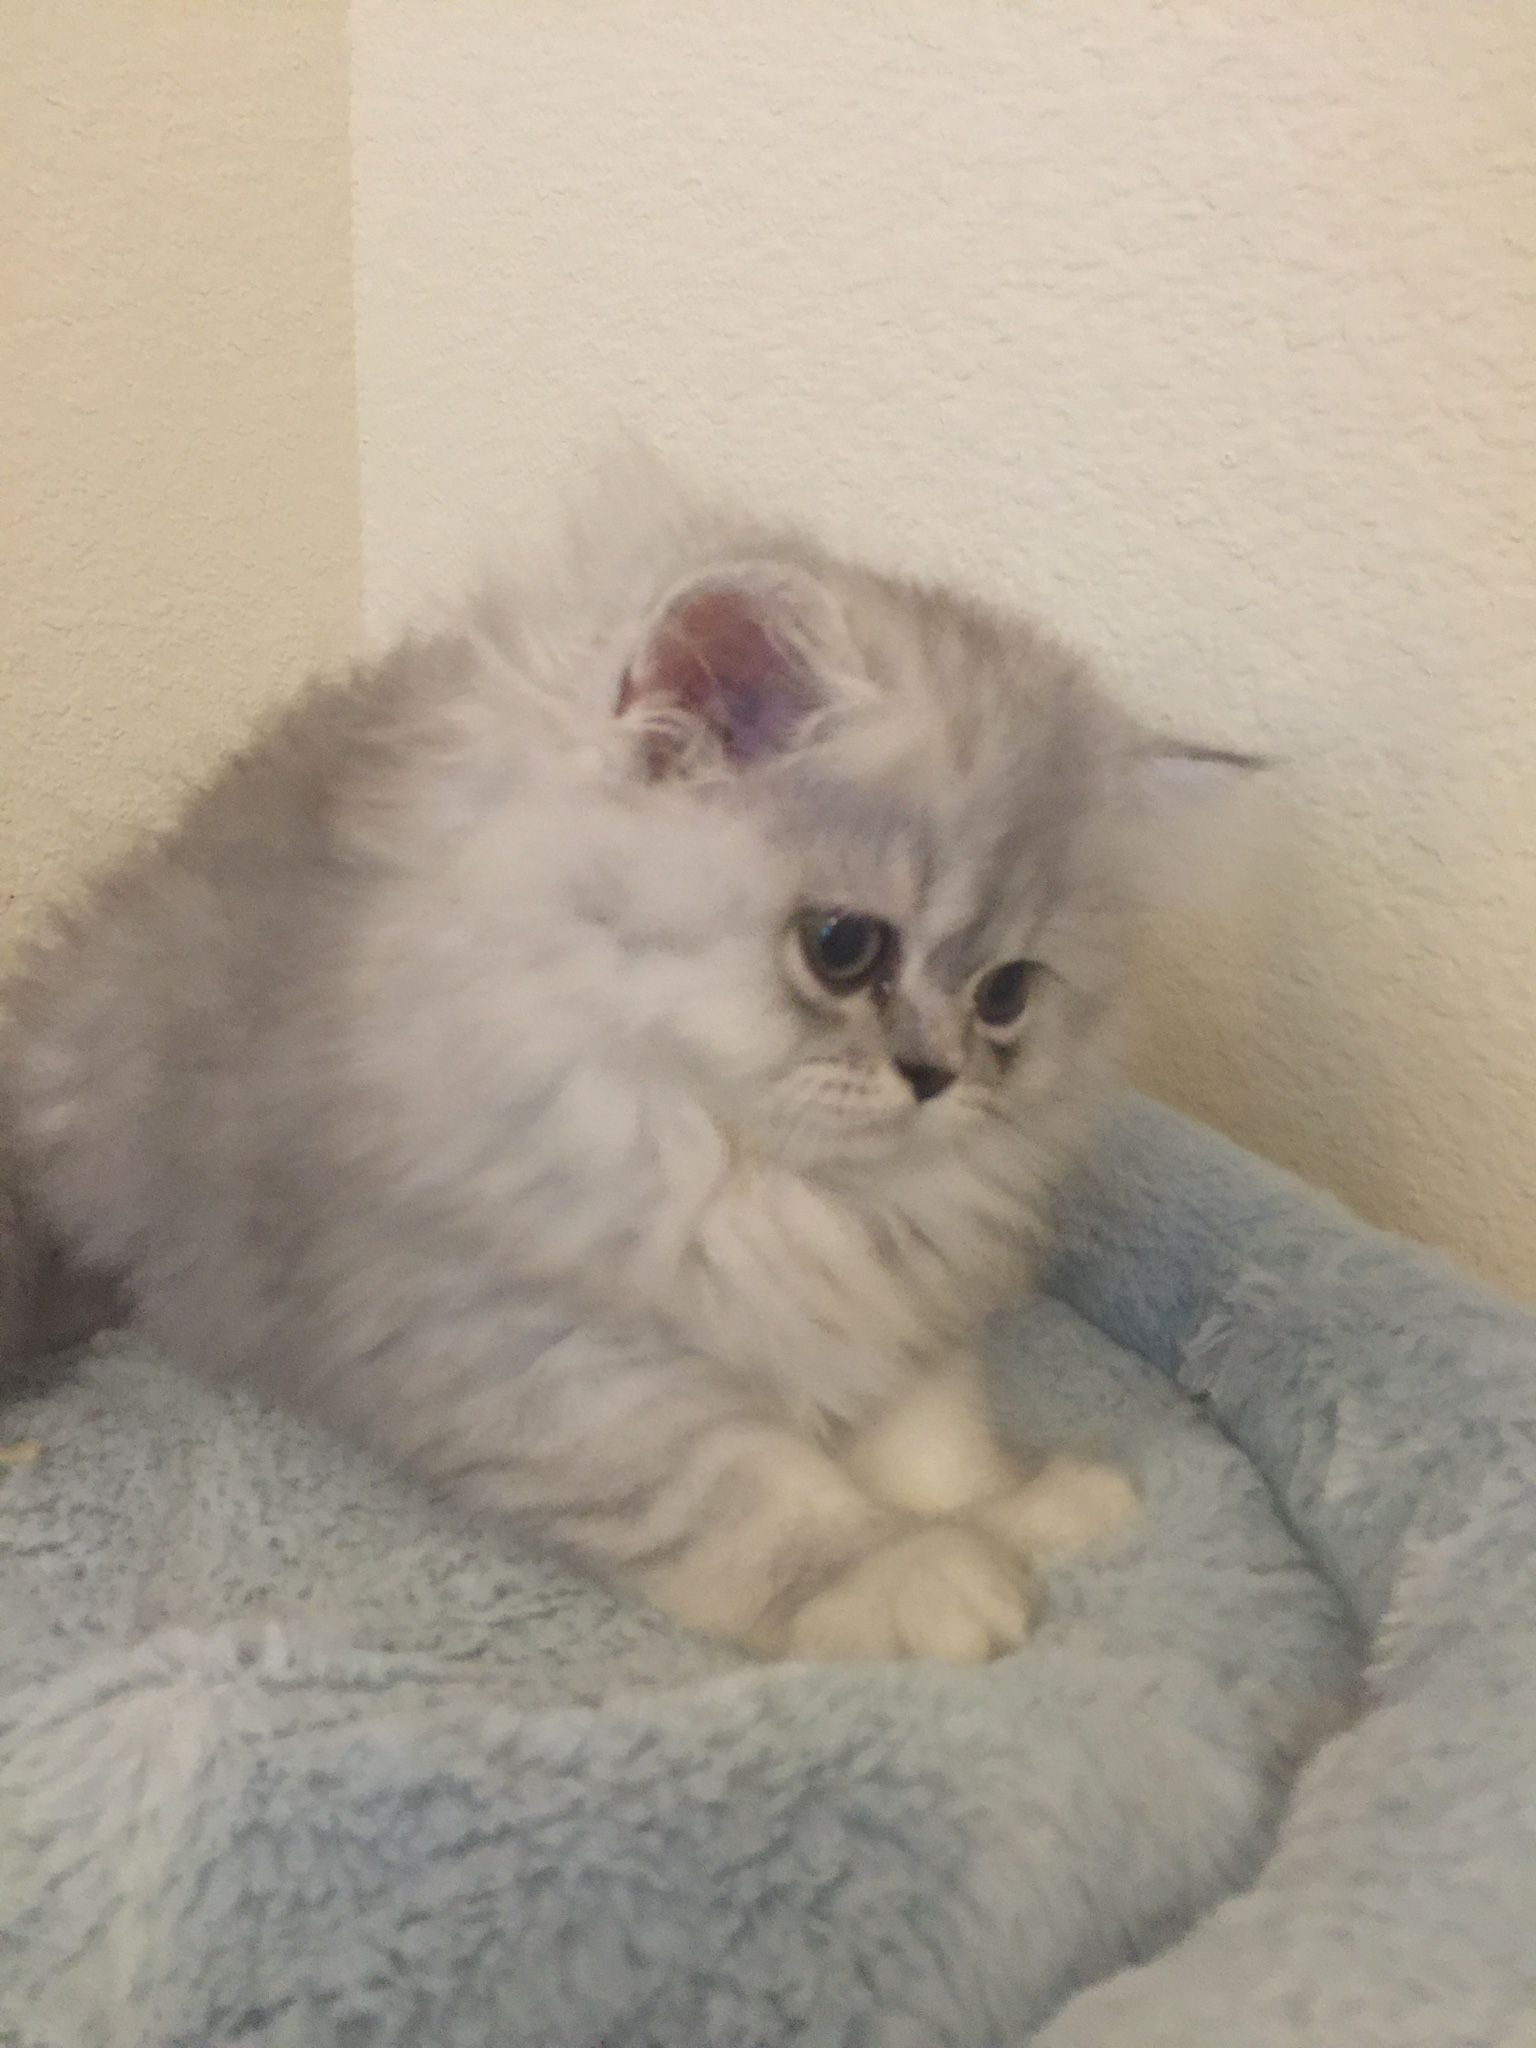 Beautiful Cfa Silver Persian Kittens For Saleshaded Silver Persian Kitten At Persiankittenpals Com I Have A Persian Kittens For Sale Persian Kittens Kittens